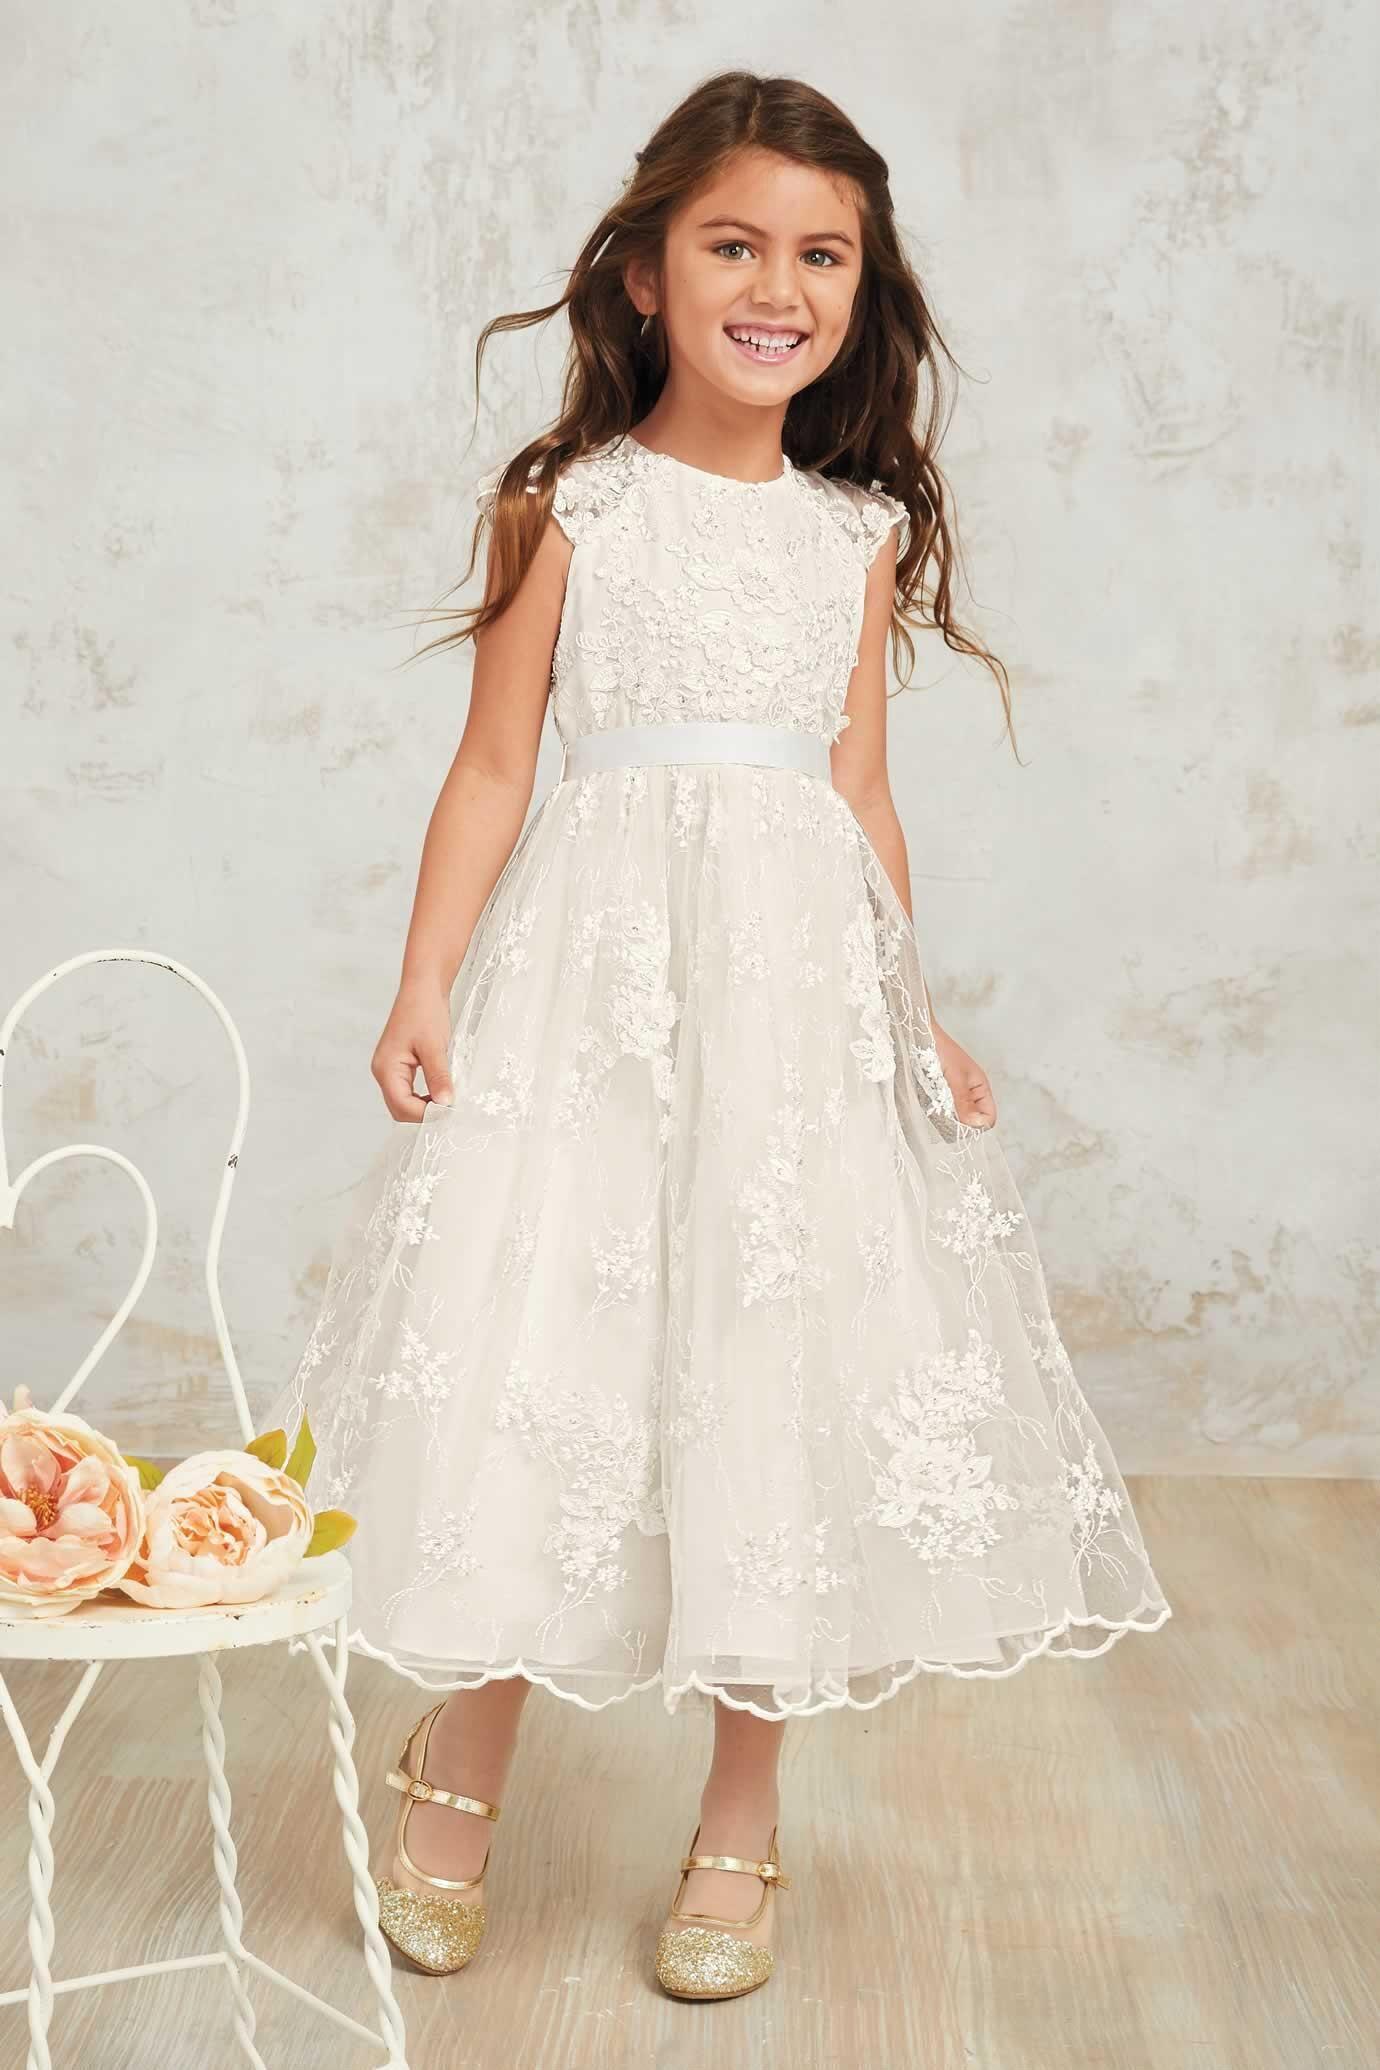 Girls Heirloom Floral Lace Dress Alt1 Long Flower Girl Dresses Floral Lace Dress Communion Dresses Lace